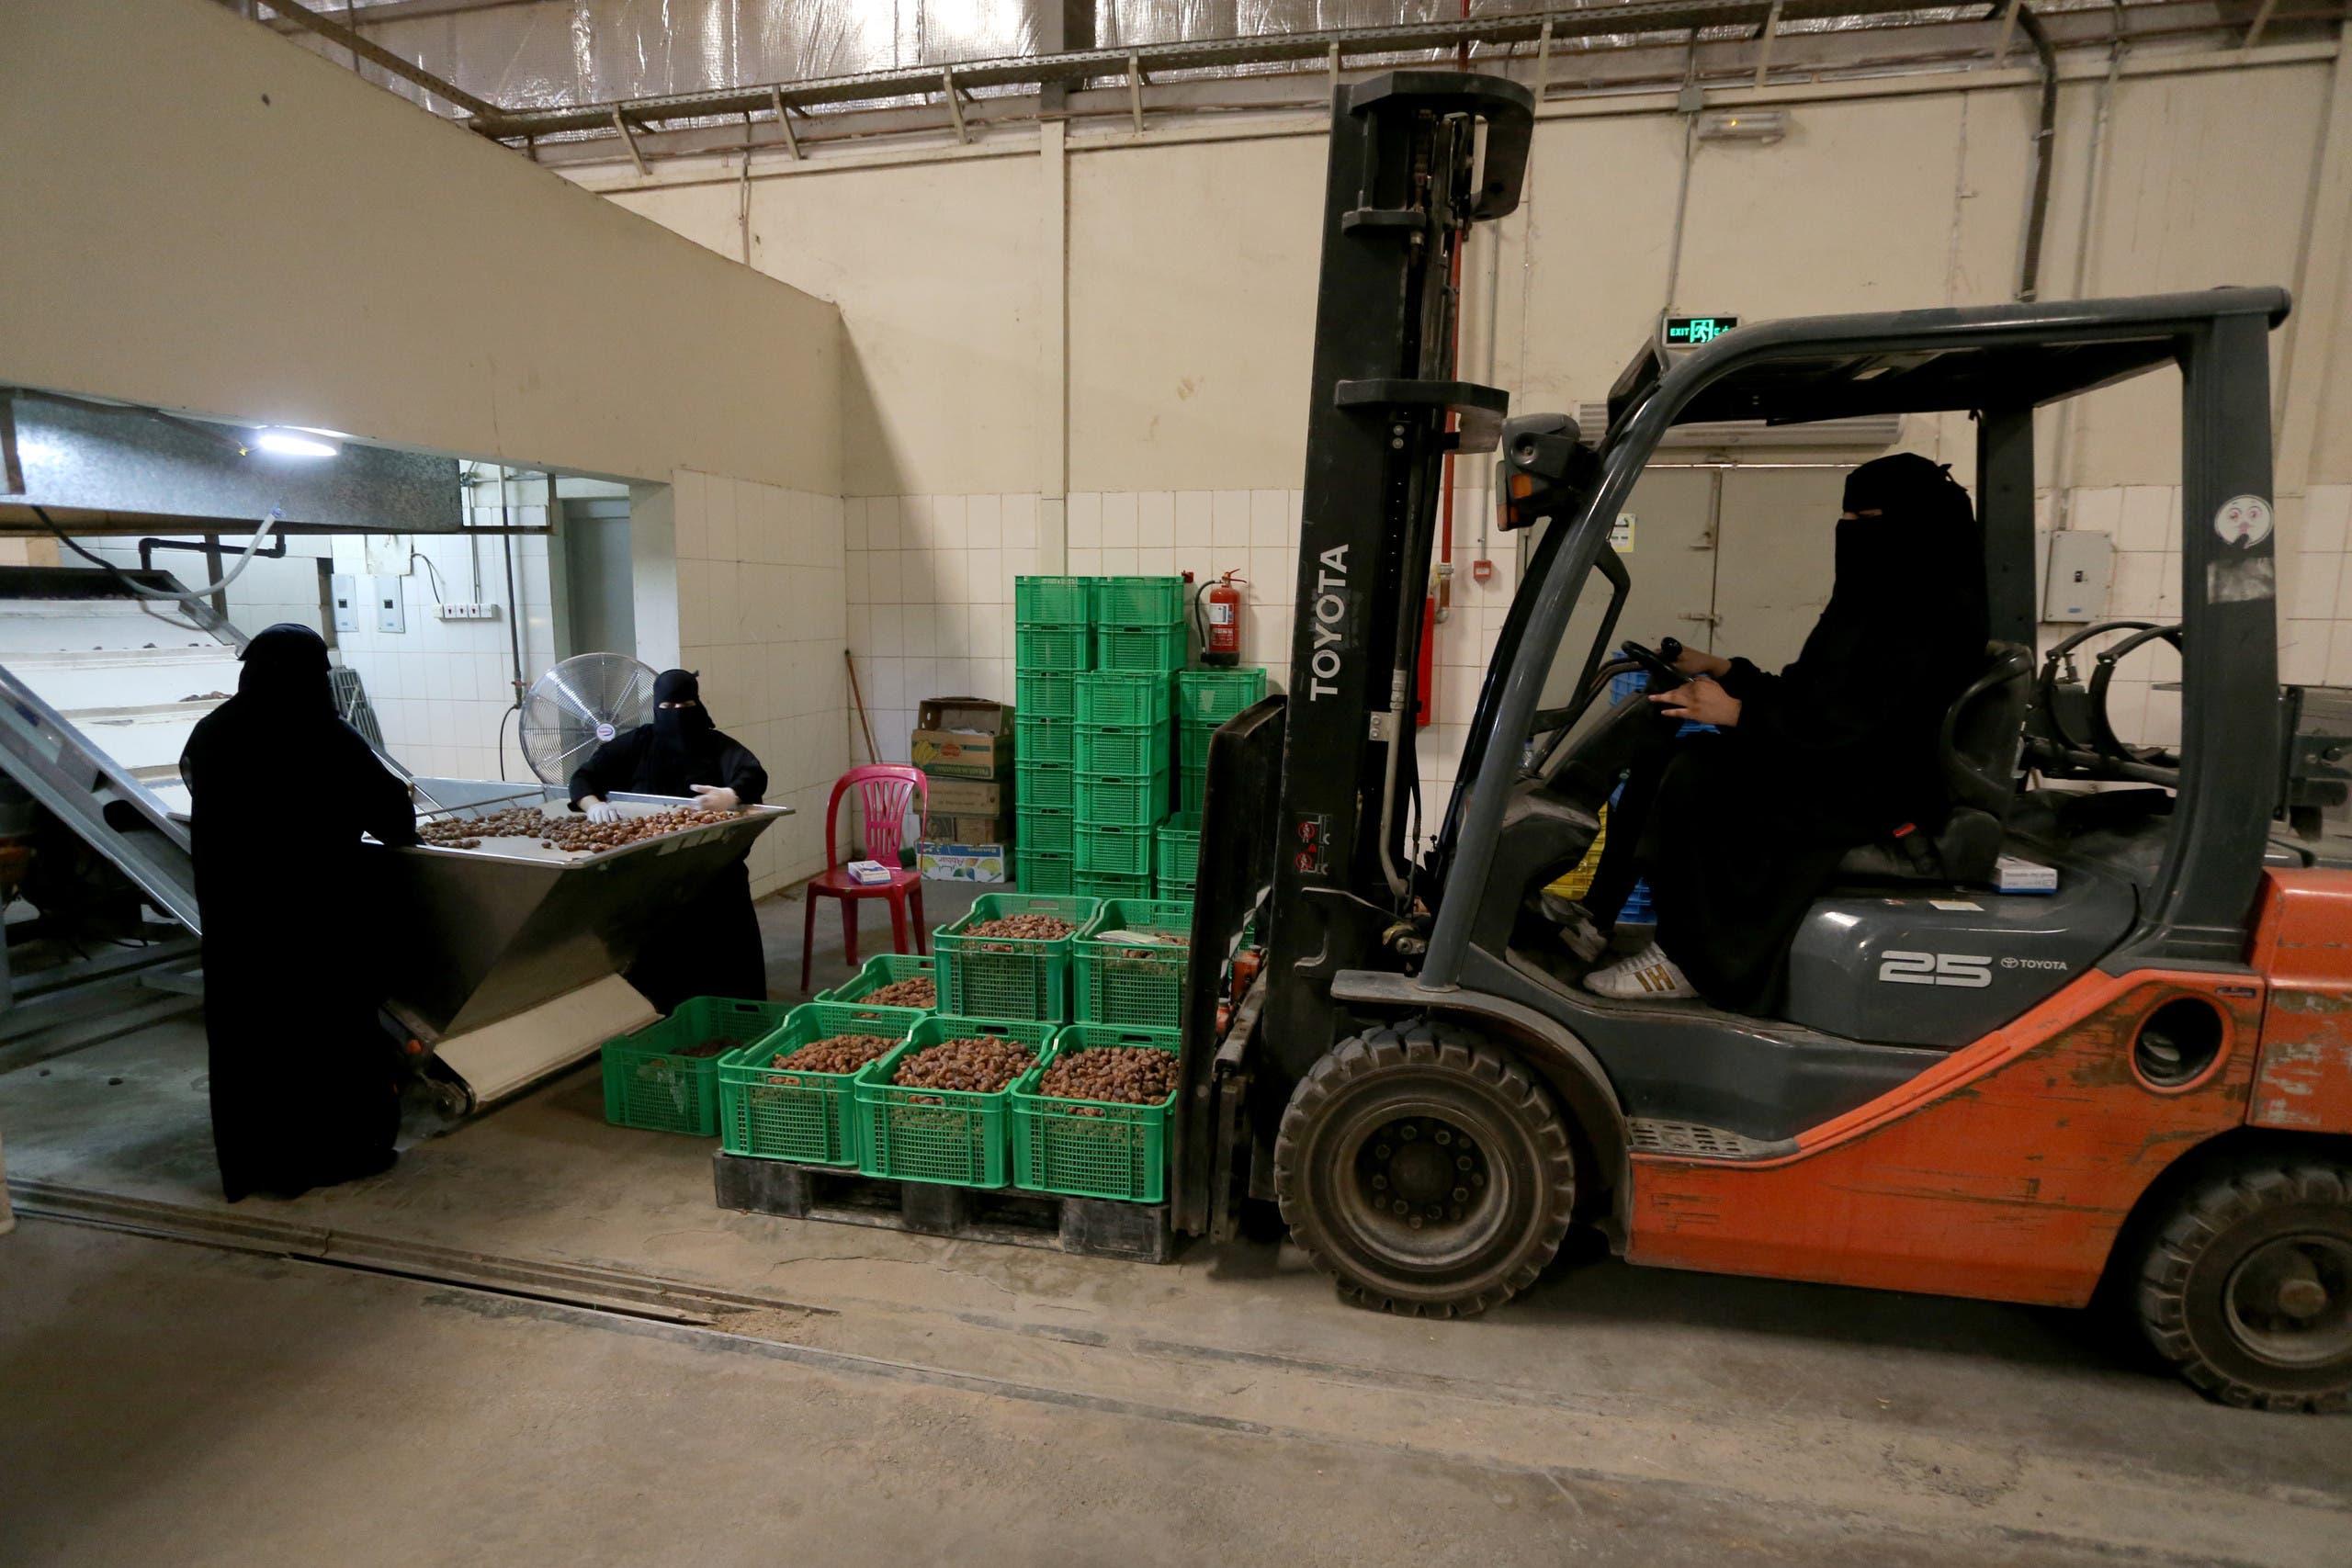 A Saudi woman drives a forklift to transport dates at a factory in Al-Ahsa, Saudi Arabia. (Reuters)